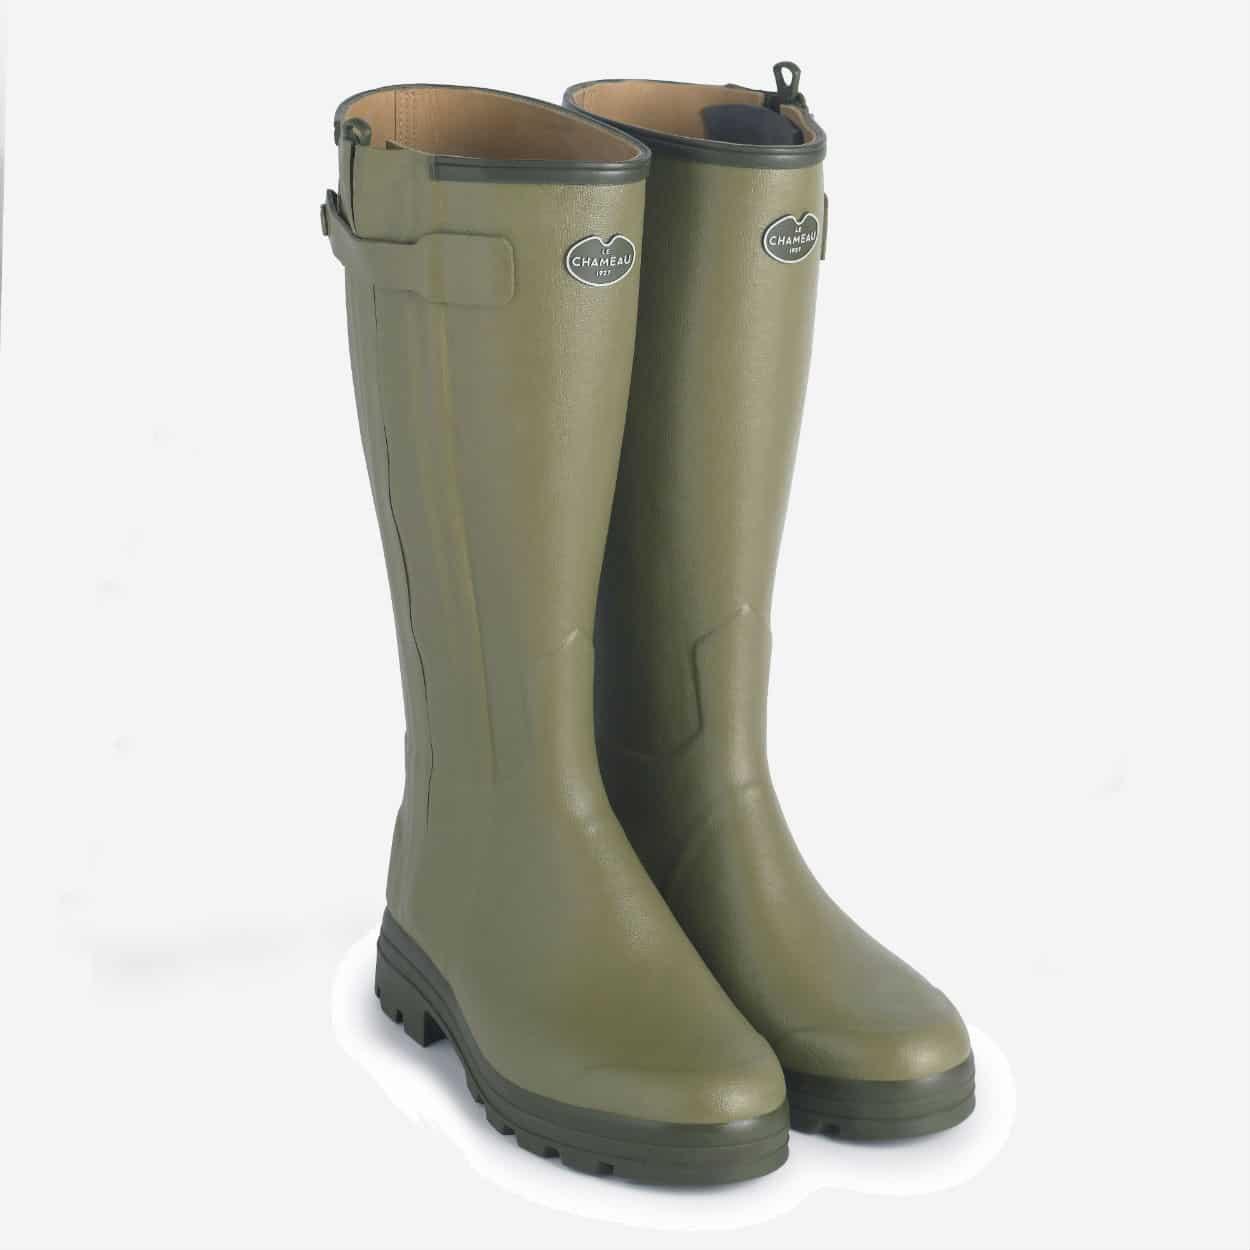 Le Chameau Chasseur Cuir Leather Lined Wellington Boots